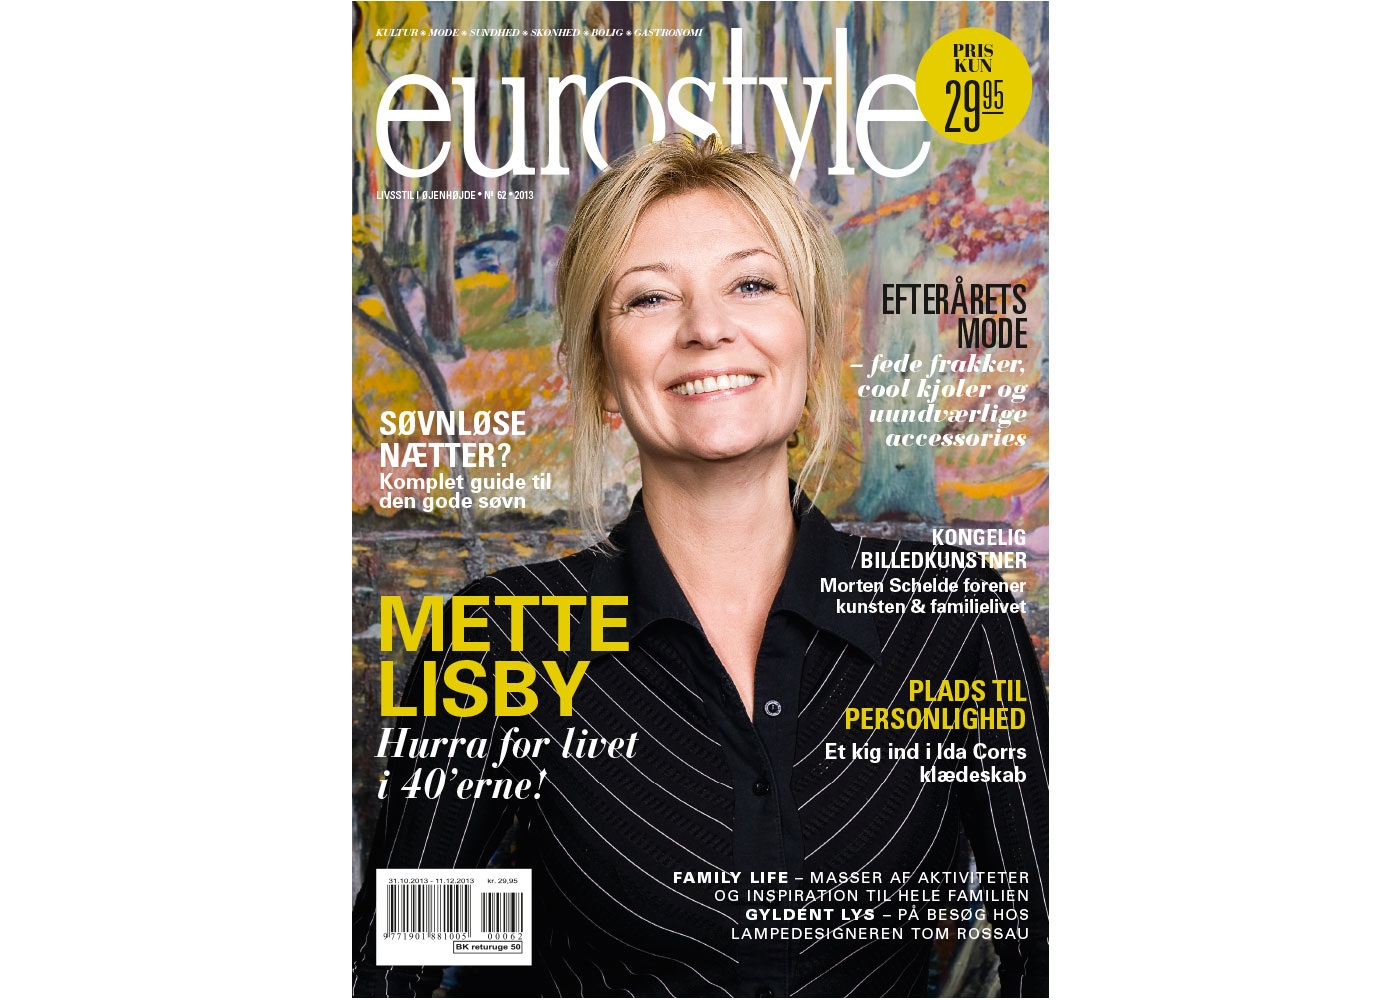 eurostyle62.jpg